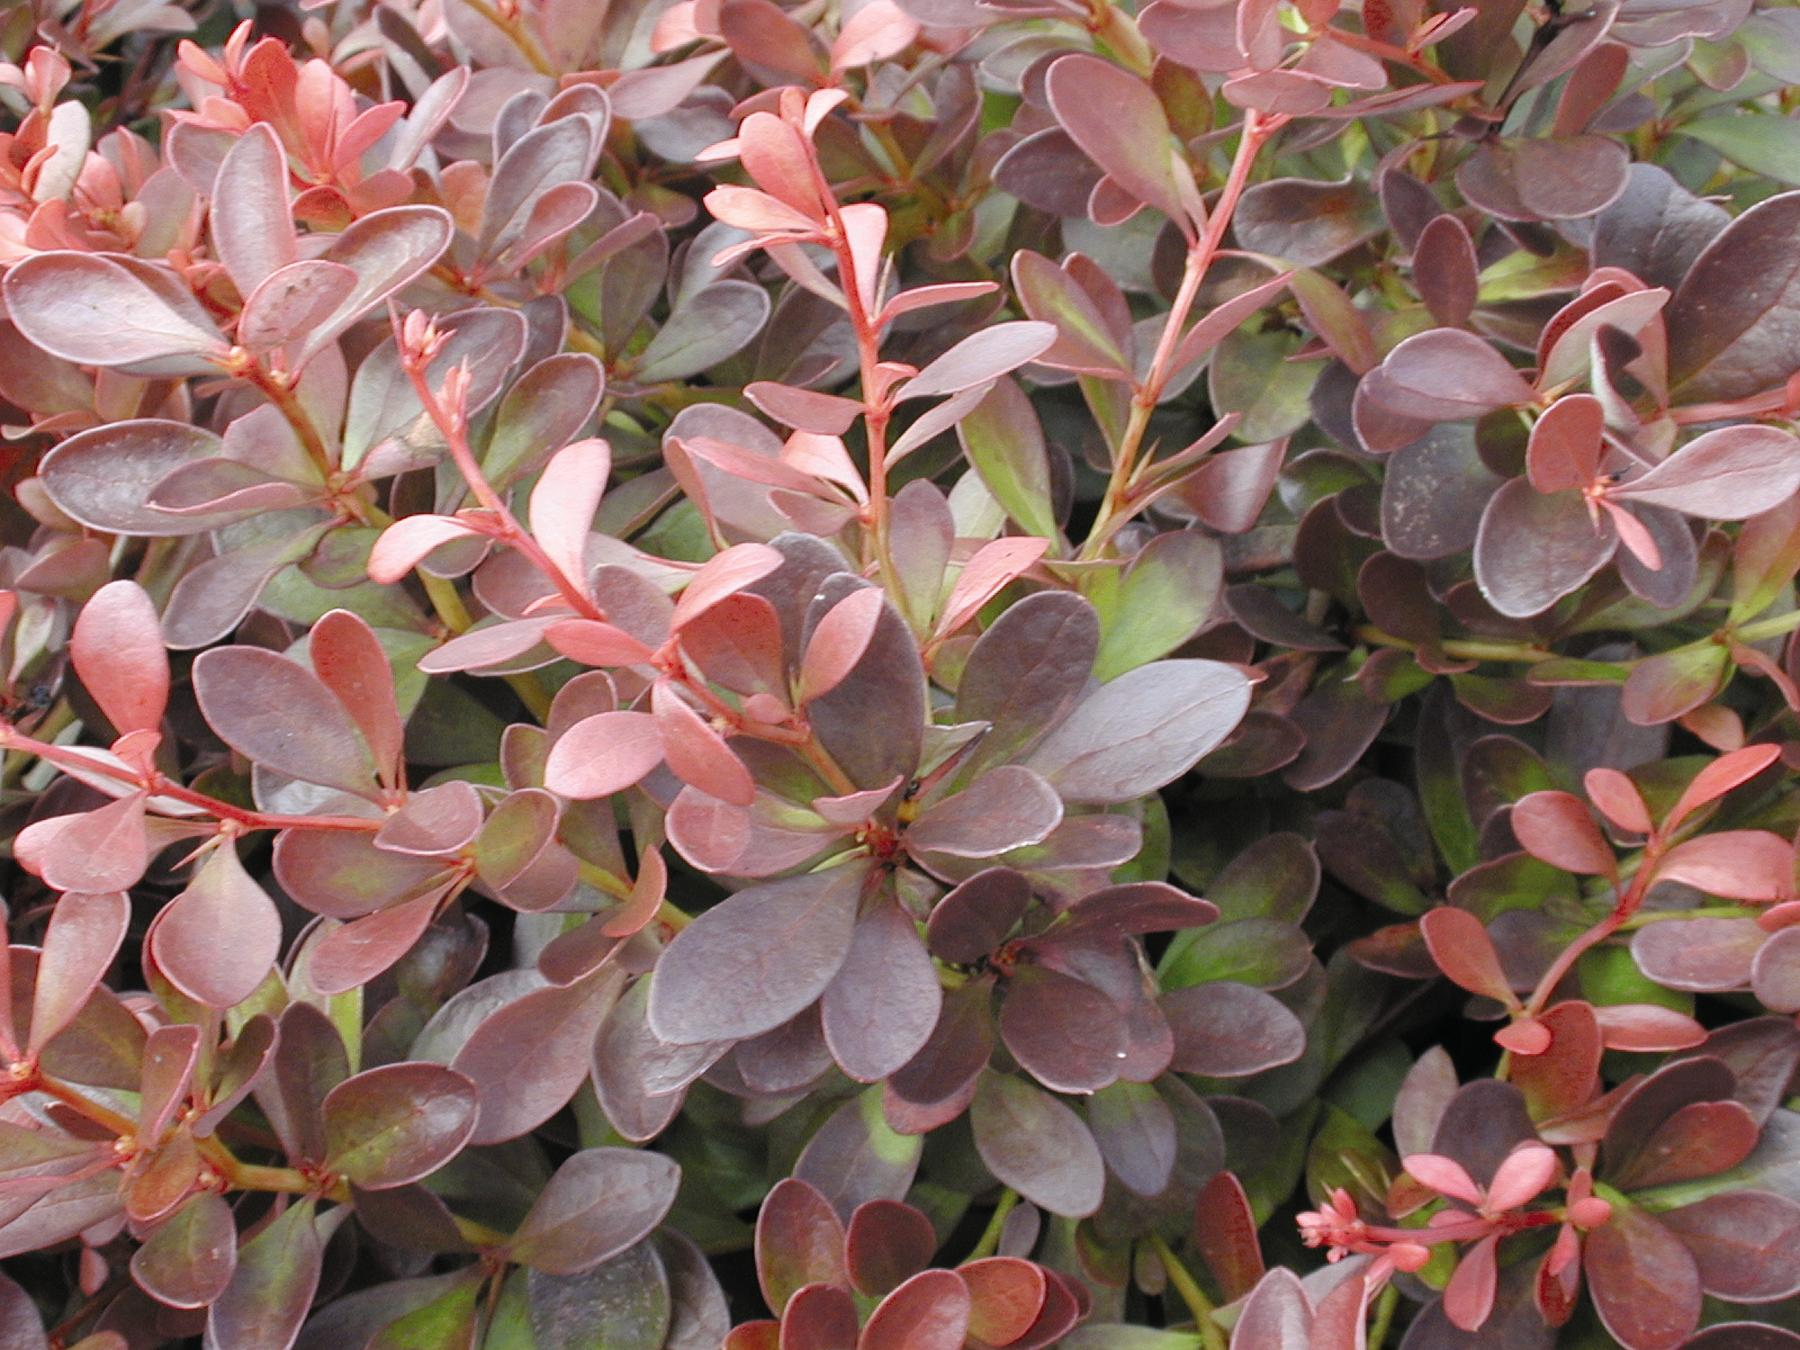 0443-1_BerbthunCrimsonPygmyJapaneseBarberry_CC.jpg.jpg